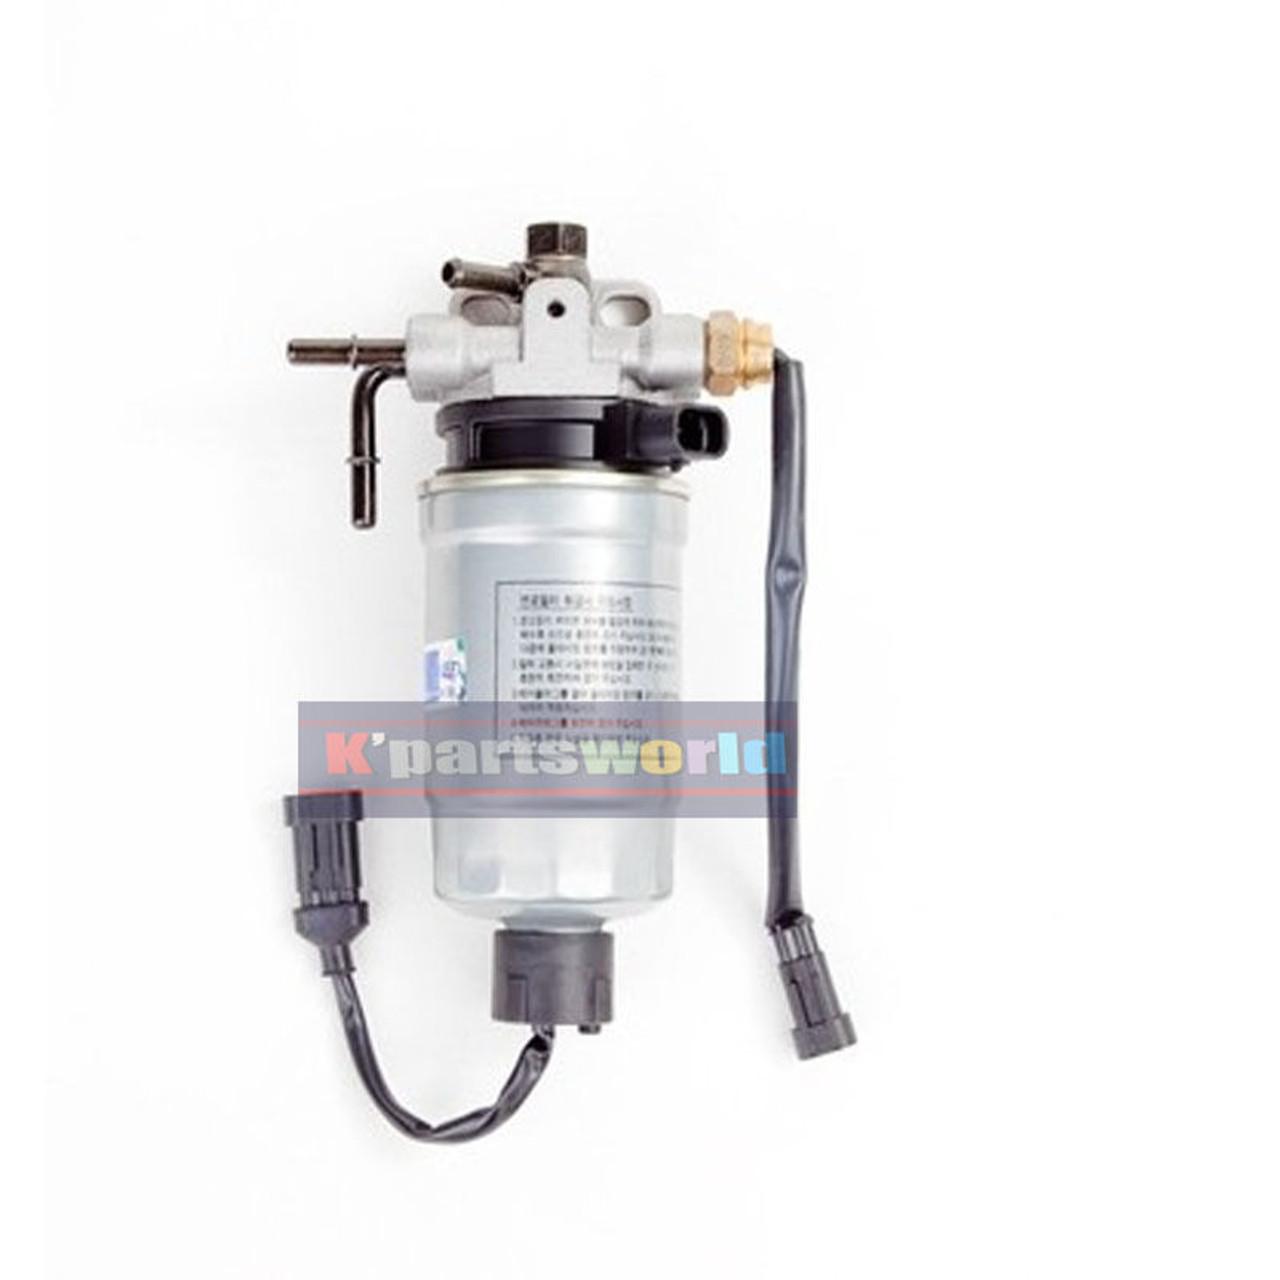 fuel filter water separator assy 319112e900 for kia. Black Bedroom Furniture Sets. Home Design Ideas